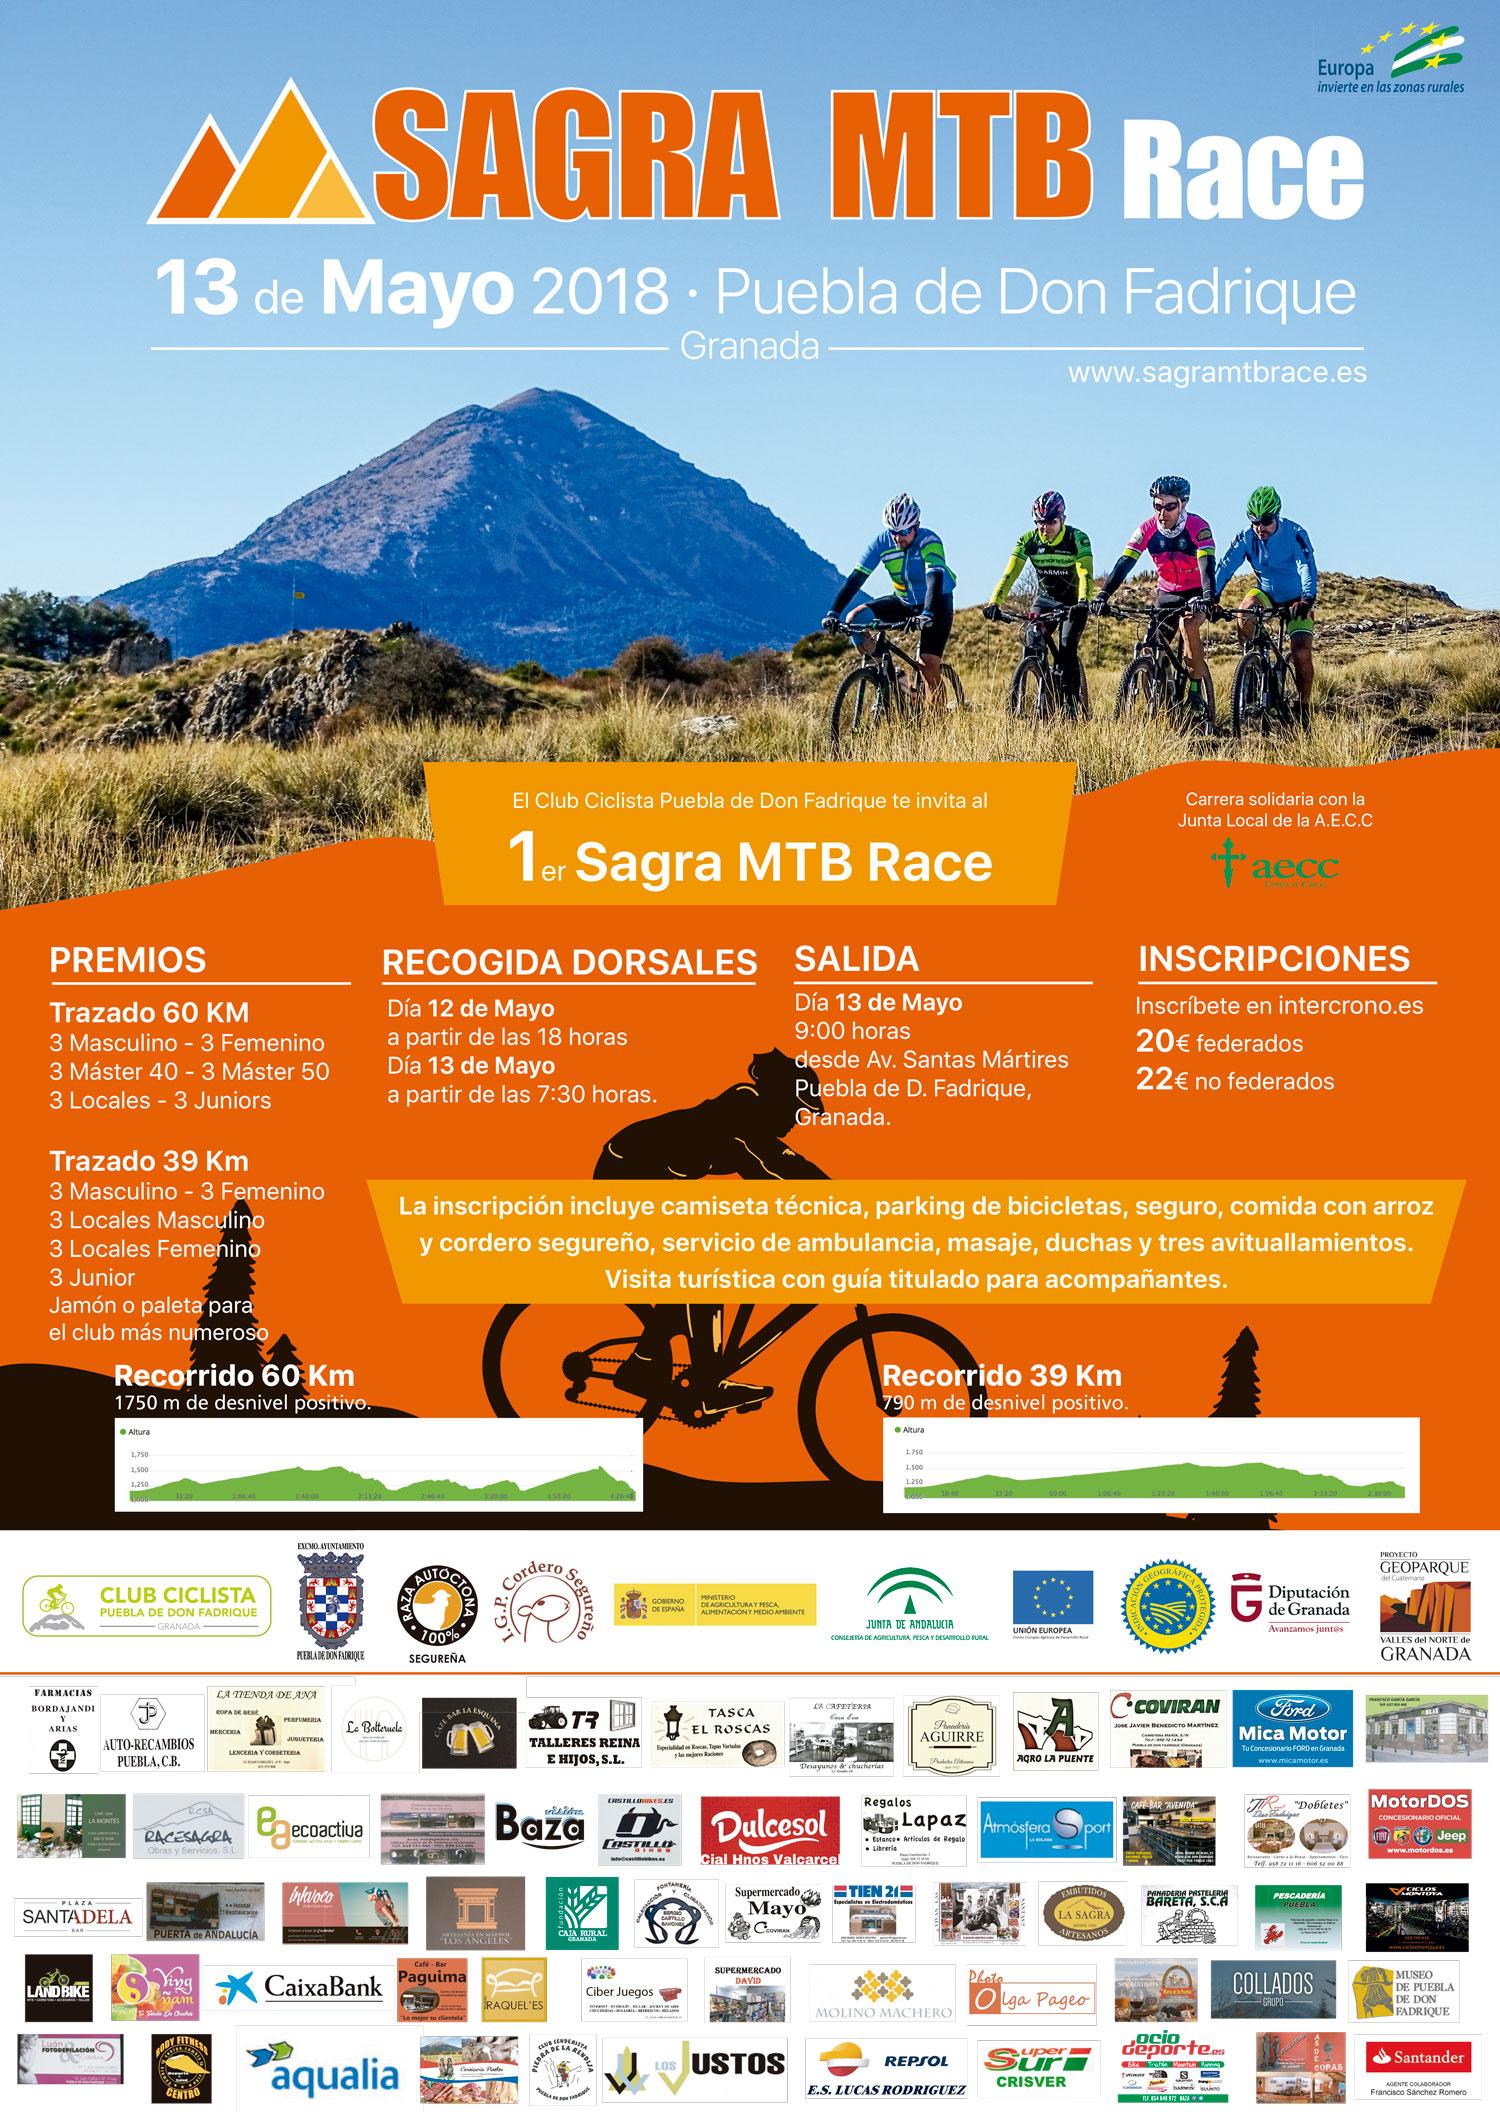 Sagra MTB Race 2018